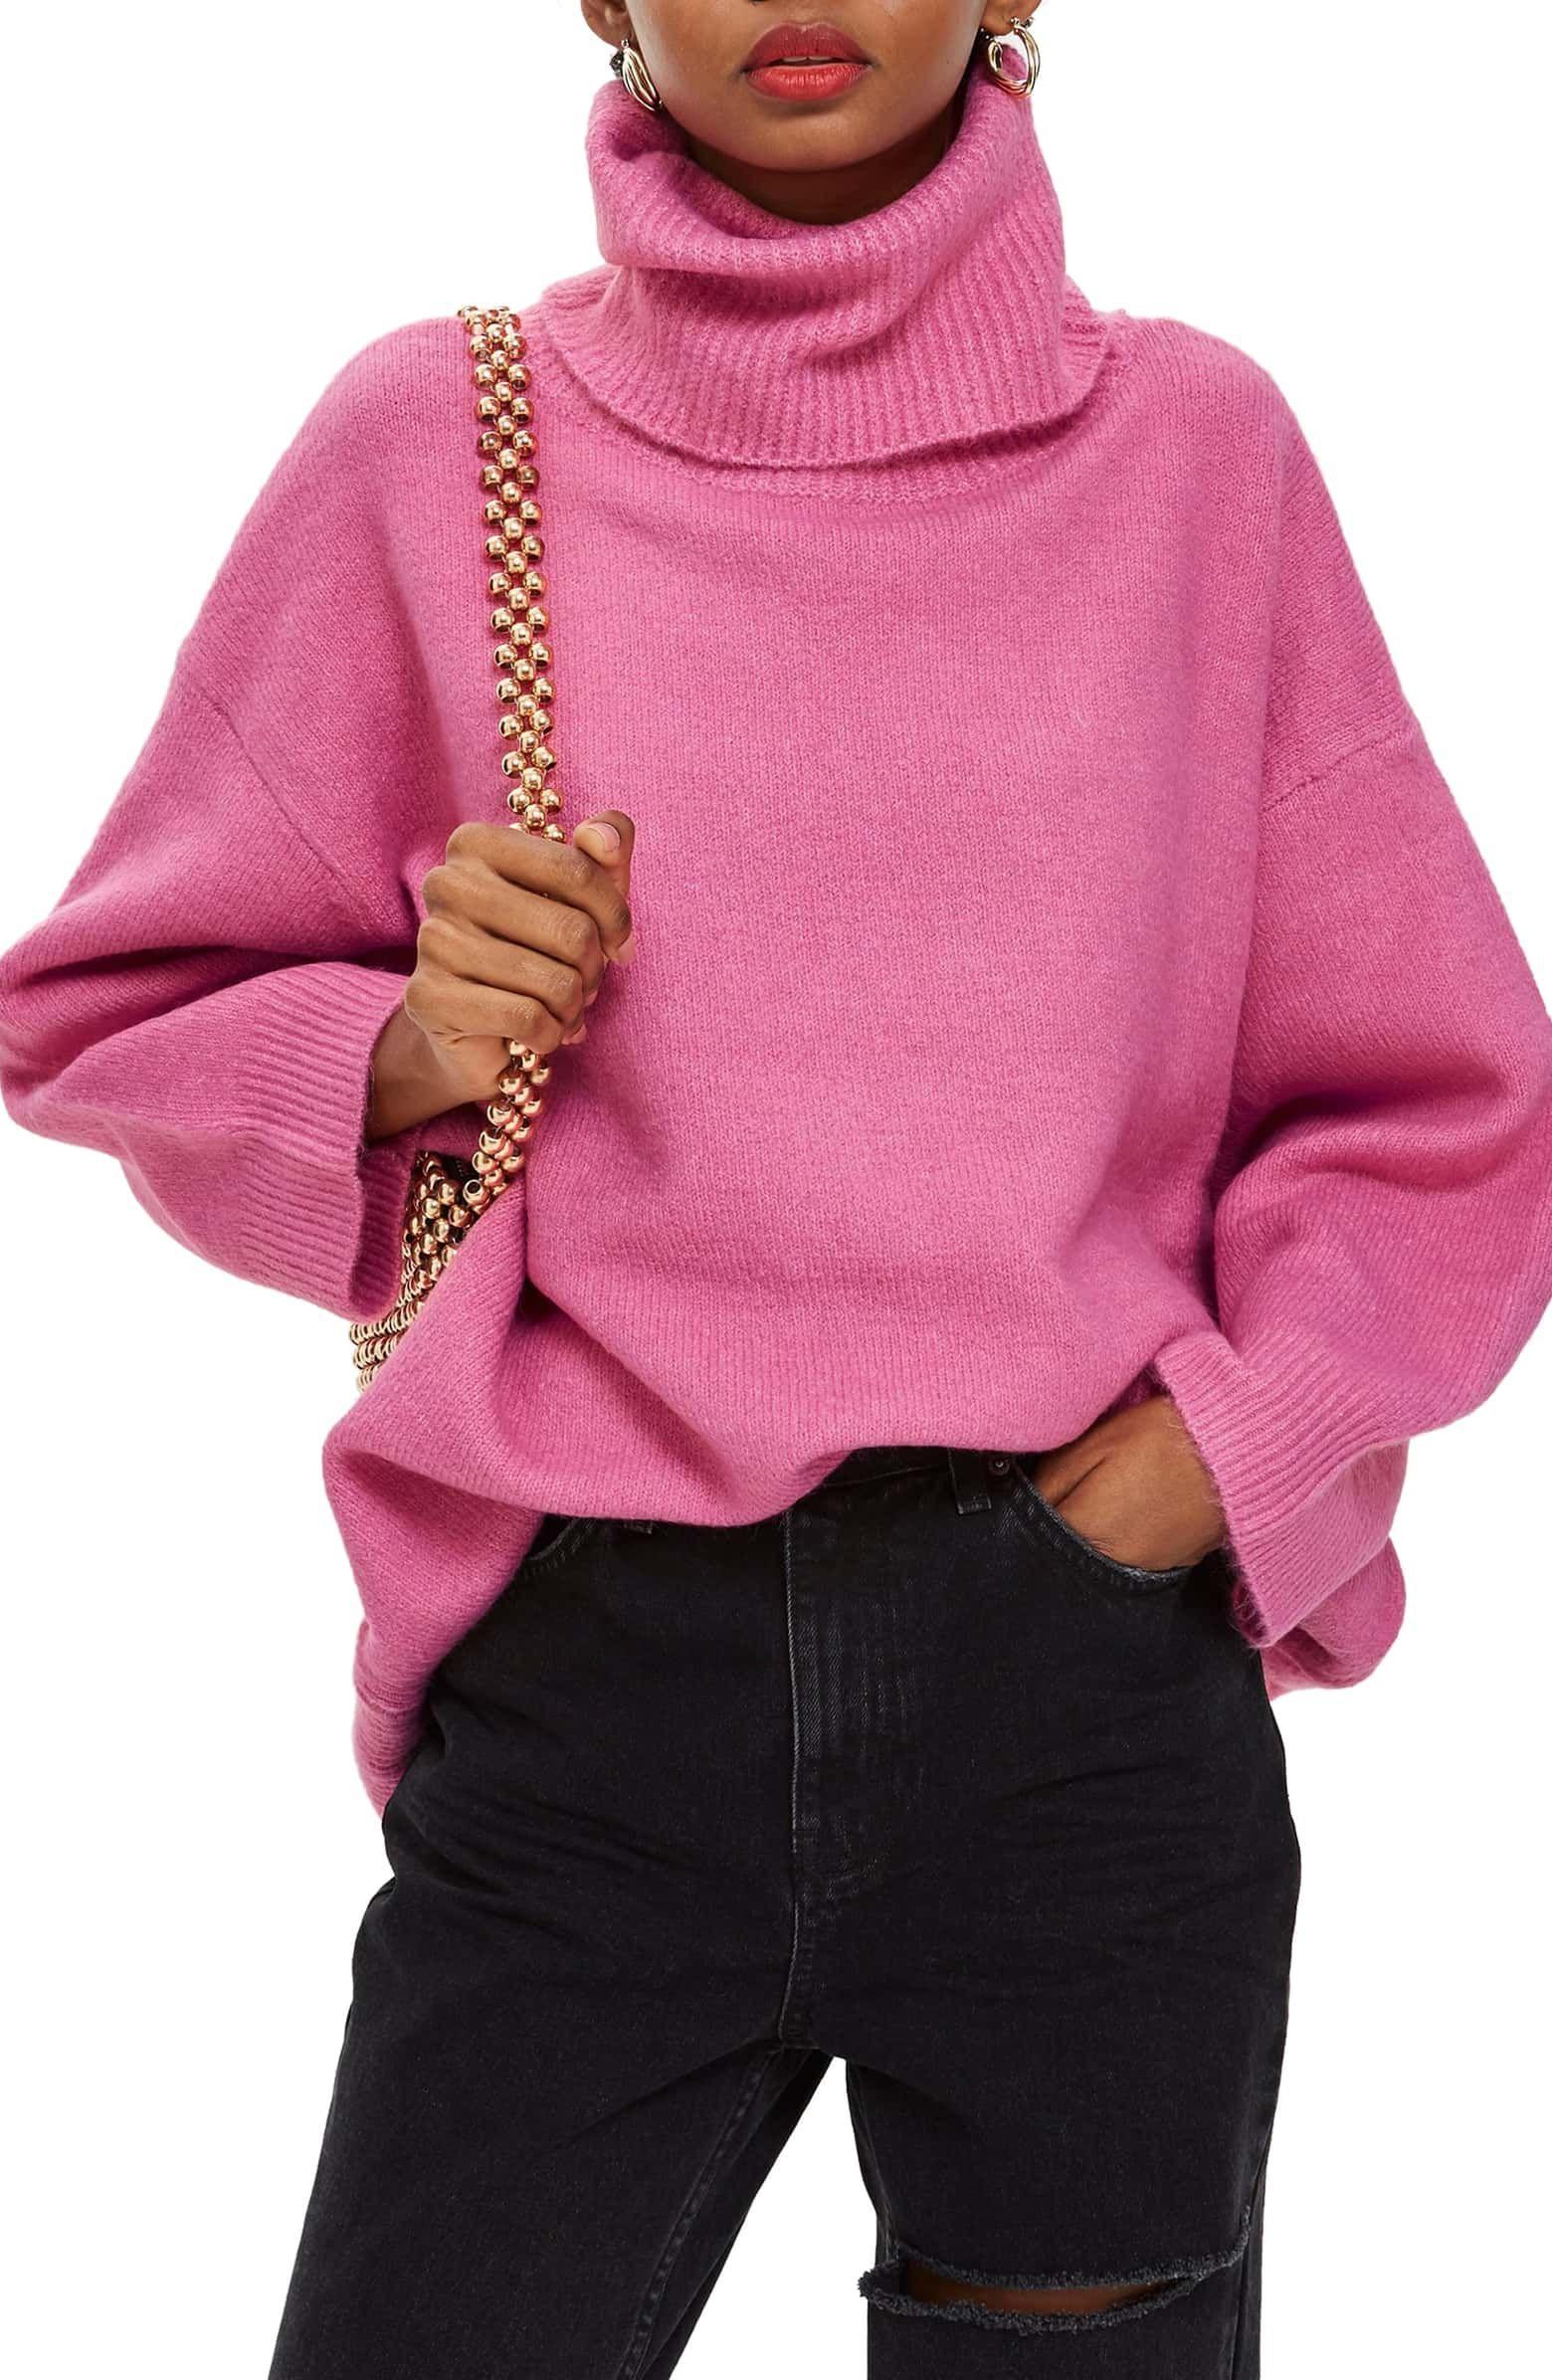 8daf5957f035 Oversize Turtleneck Sweater